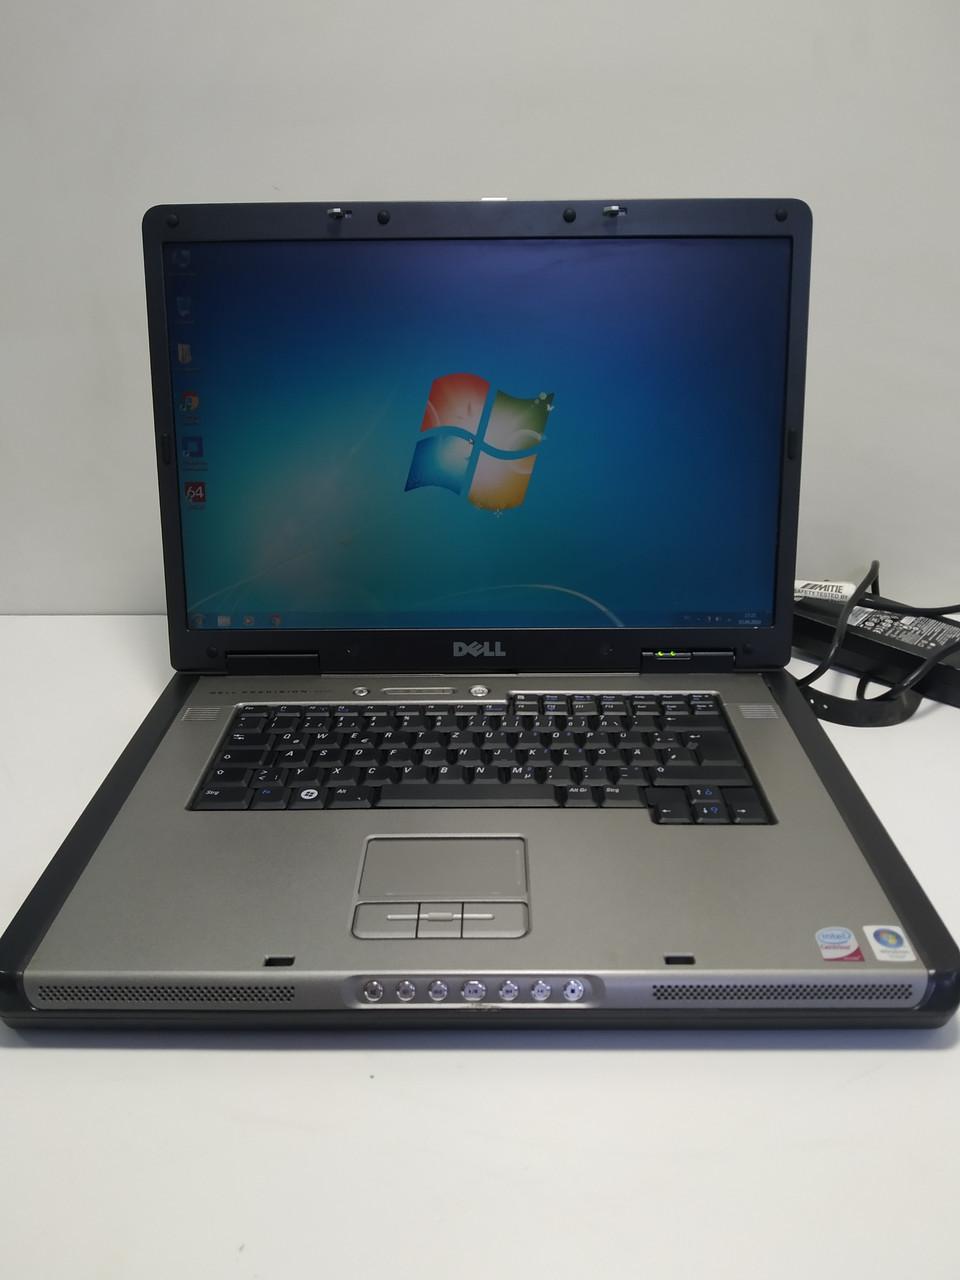 Графическая станция для CAD\  Dell Precision M6300\ Intel T8300 2,4 \ 4 ГБ ОЗУ \ 160 ГБ HDD\ Батарея до 1 часа